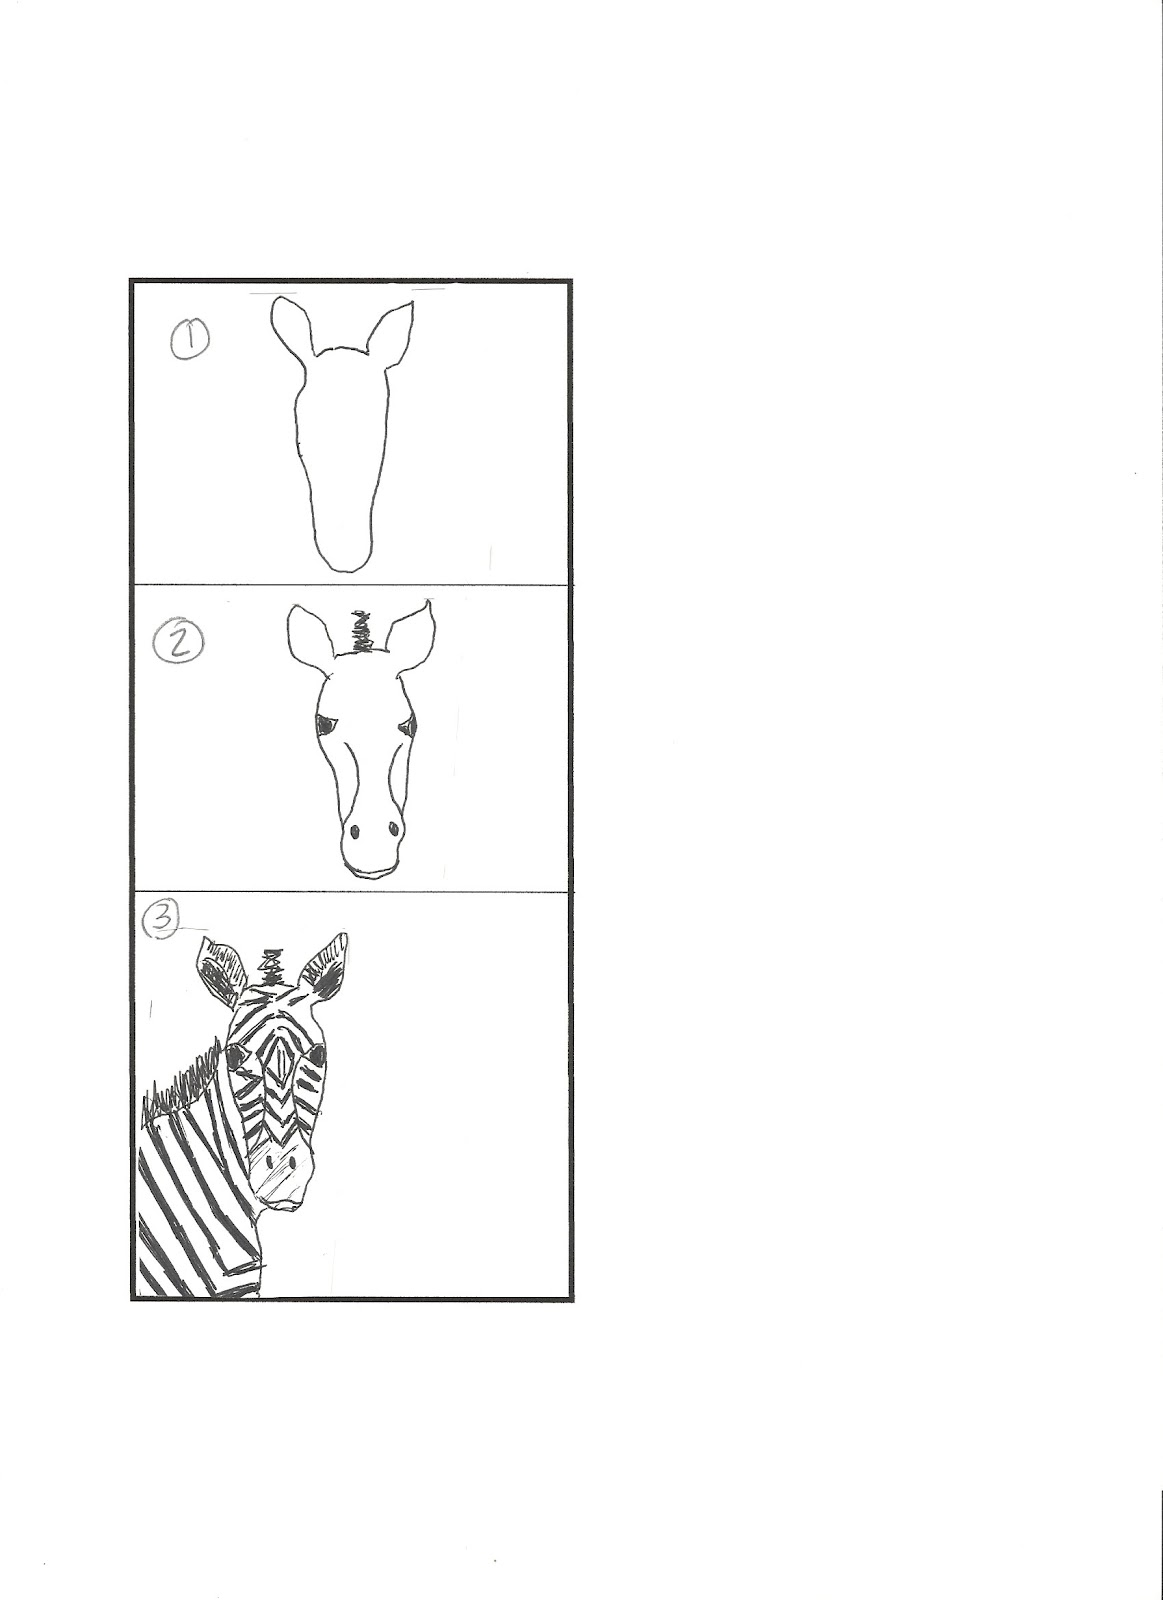 How To Draw A Zebra Head Step By Step For Kids